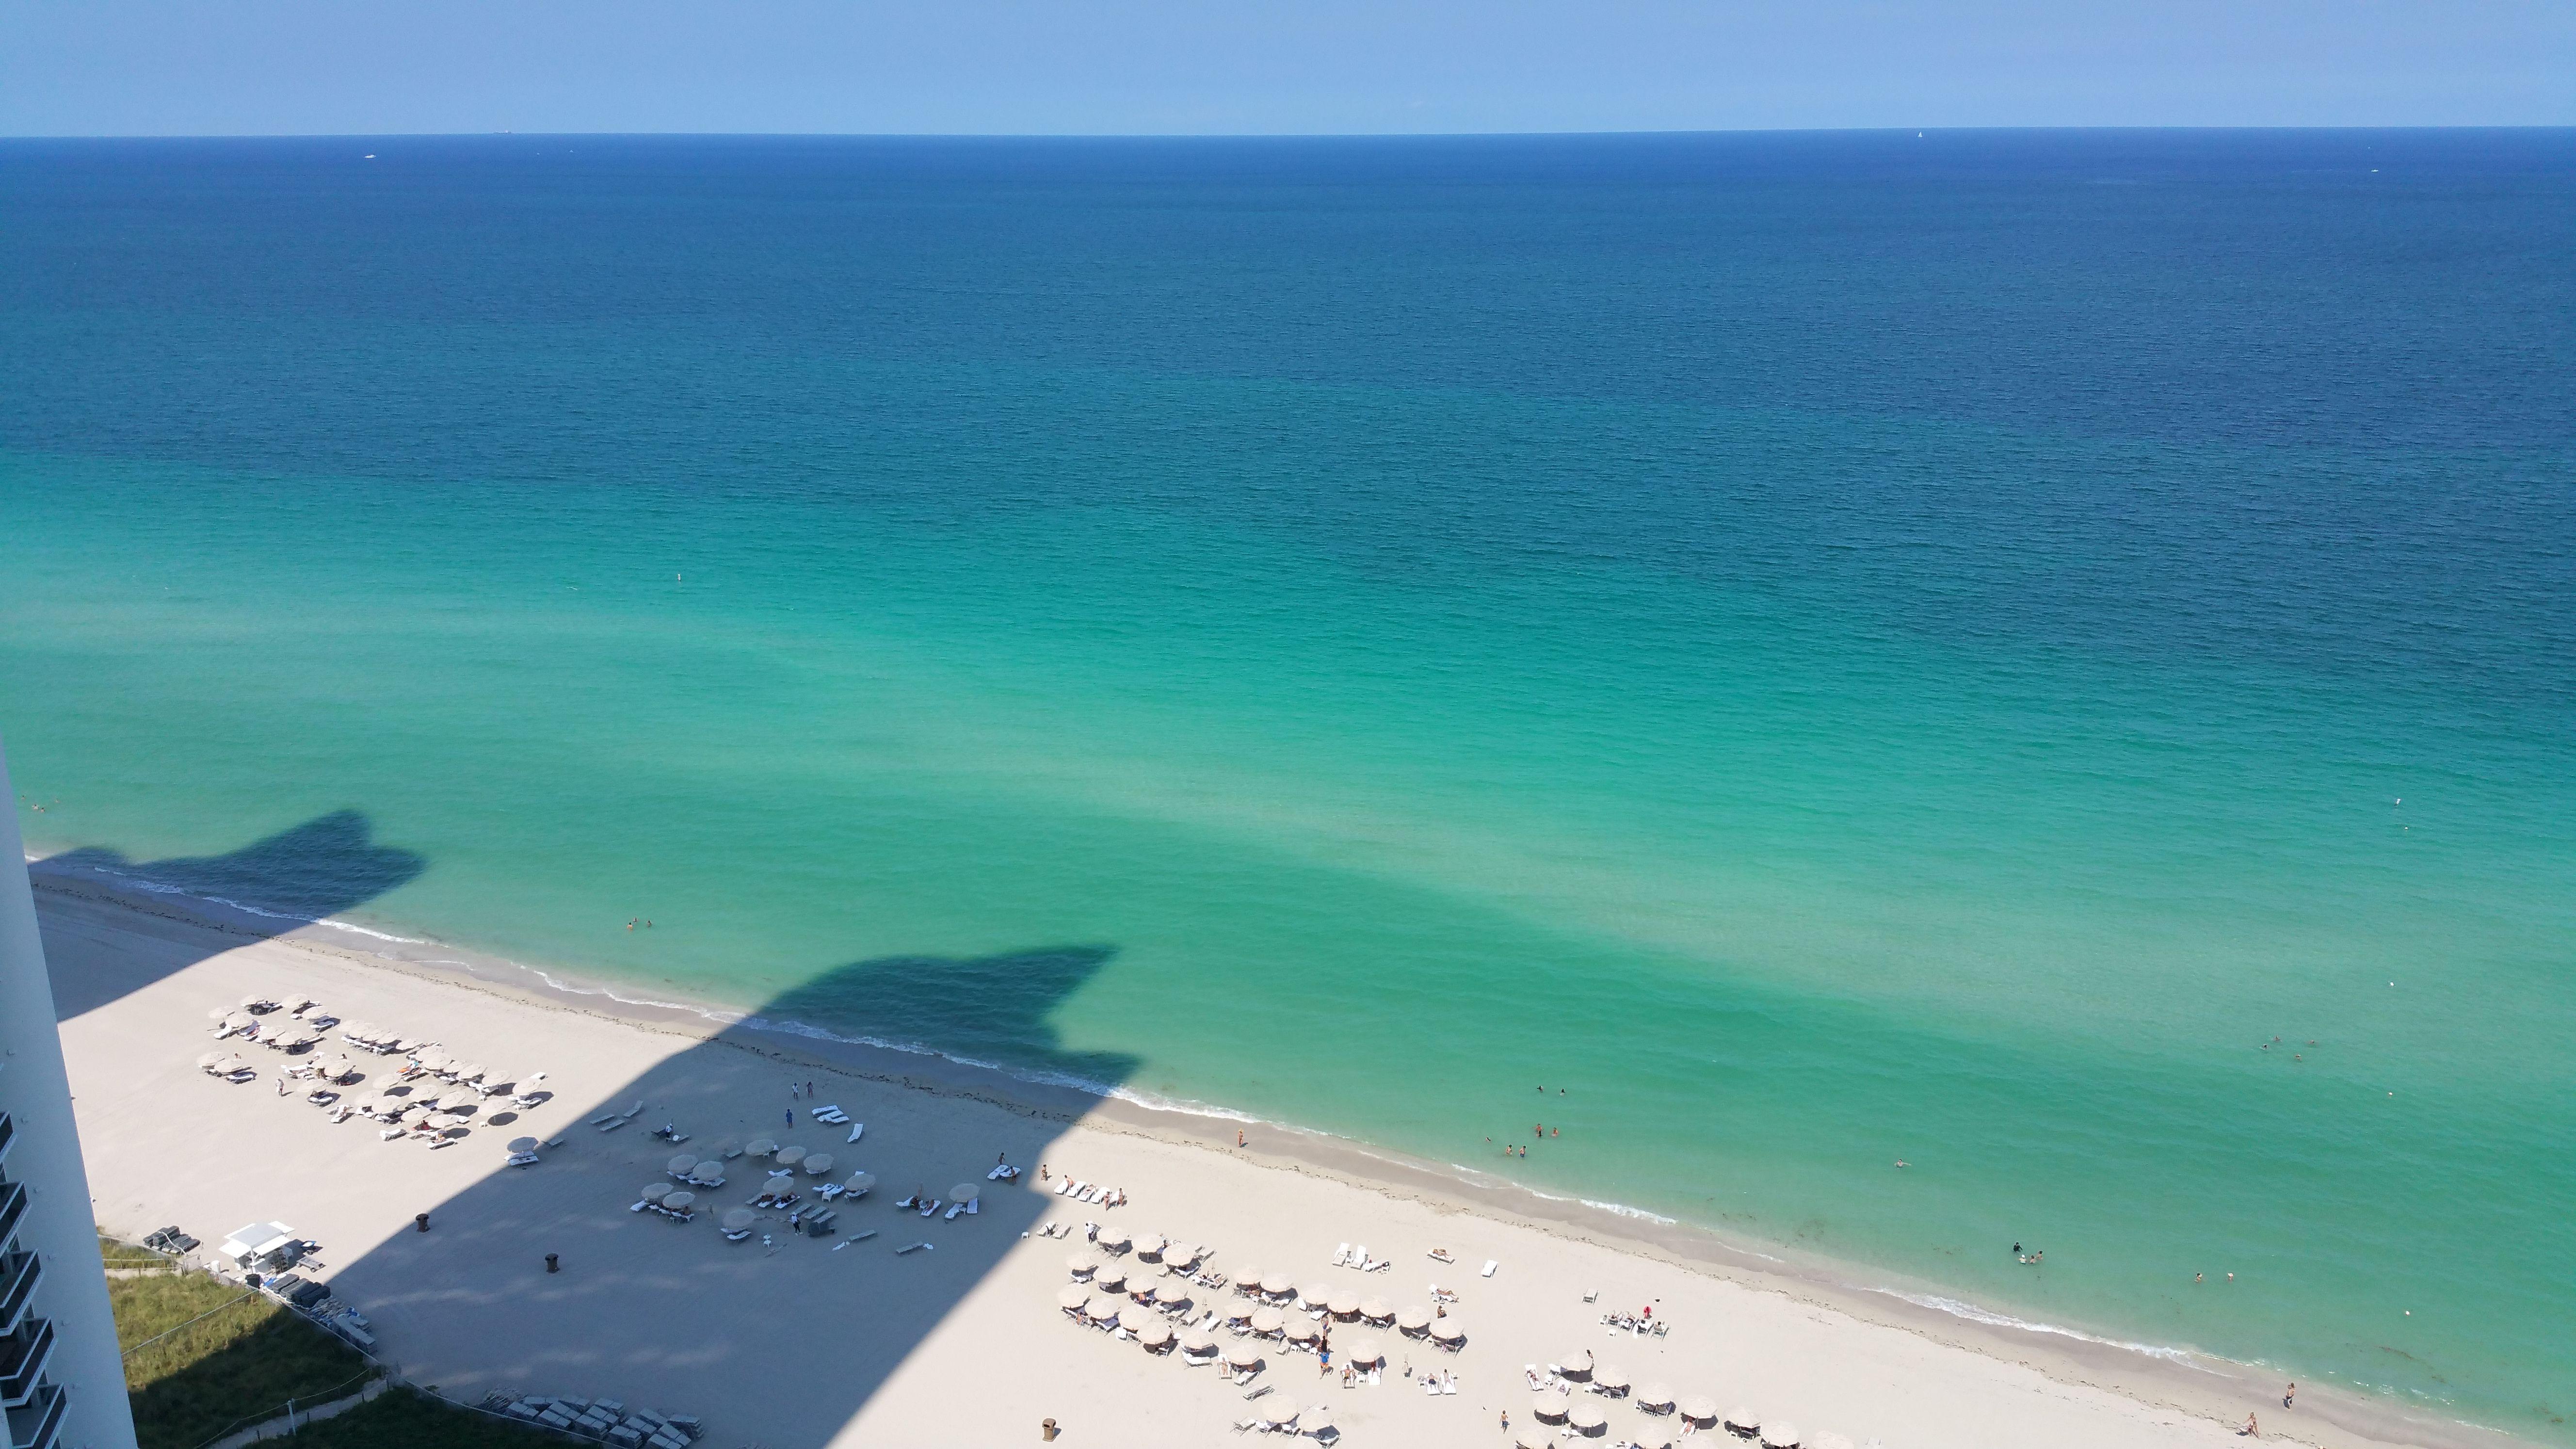 Beach Florida Tour Day 5 The VIP